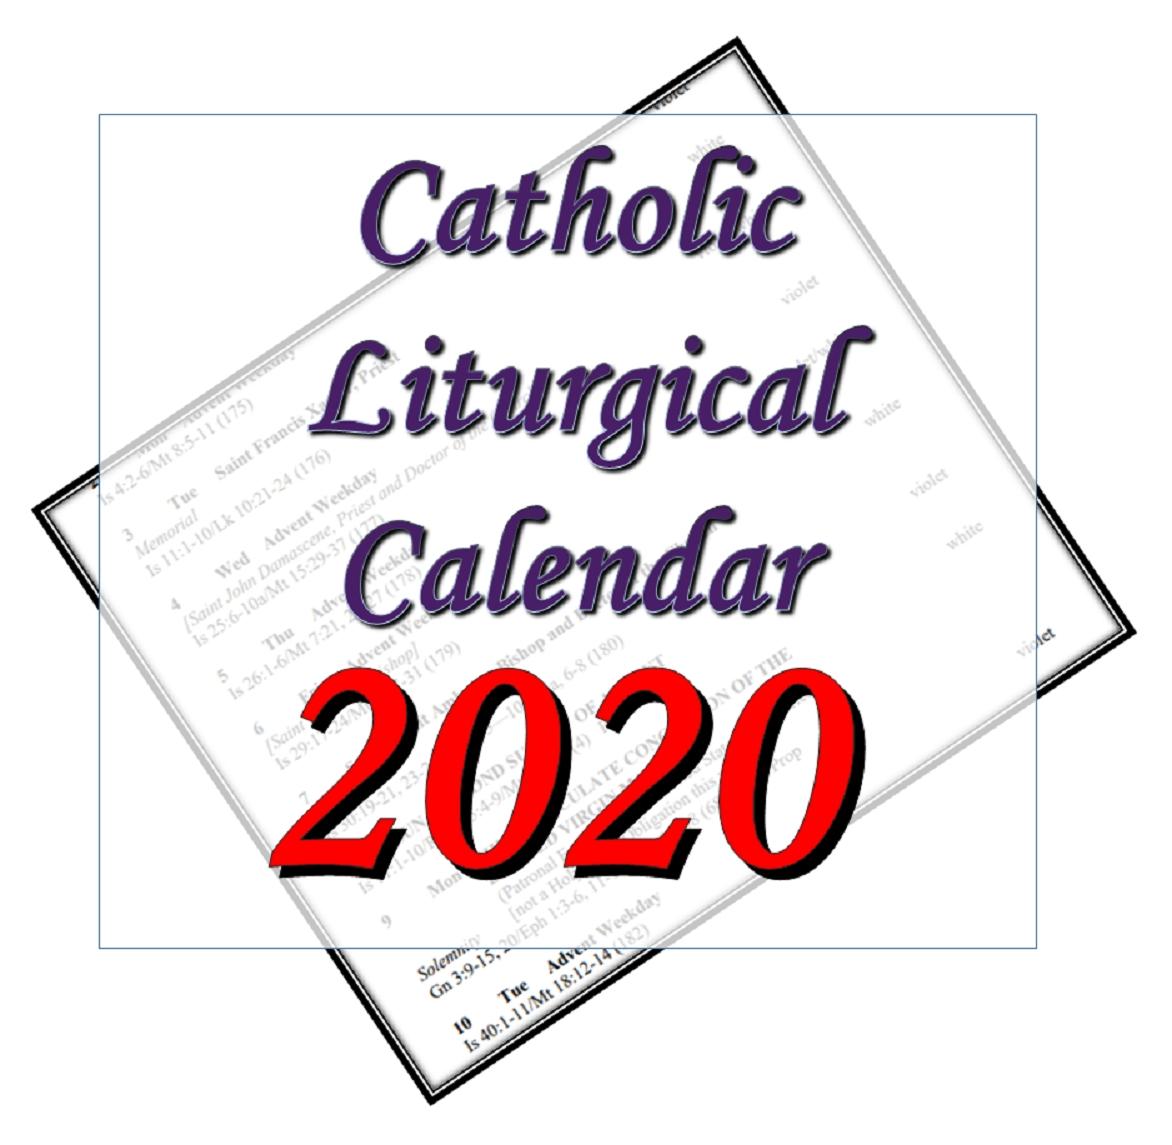 Liturgytools: Catholic Liturgical Calendars For 2020 throughout Catholic Lectionary 2020 Printable Calendar